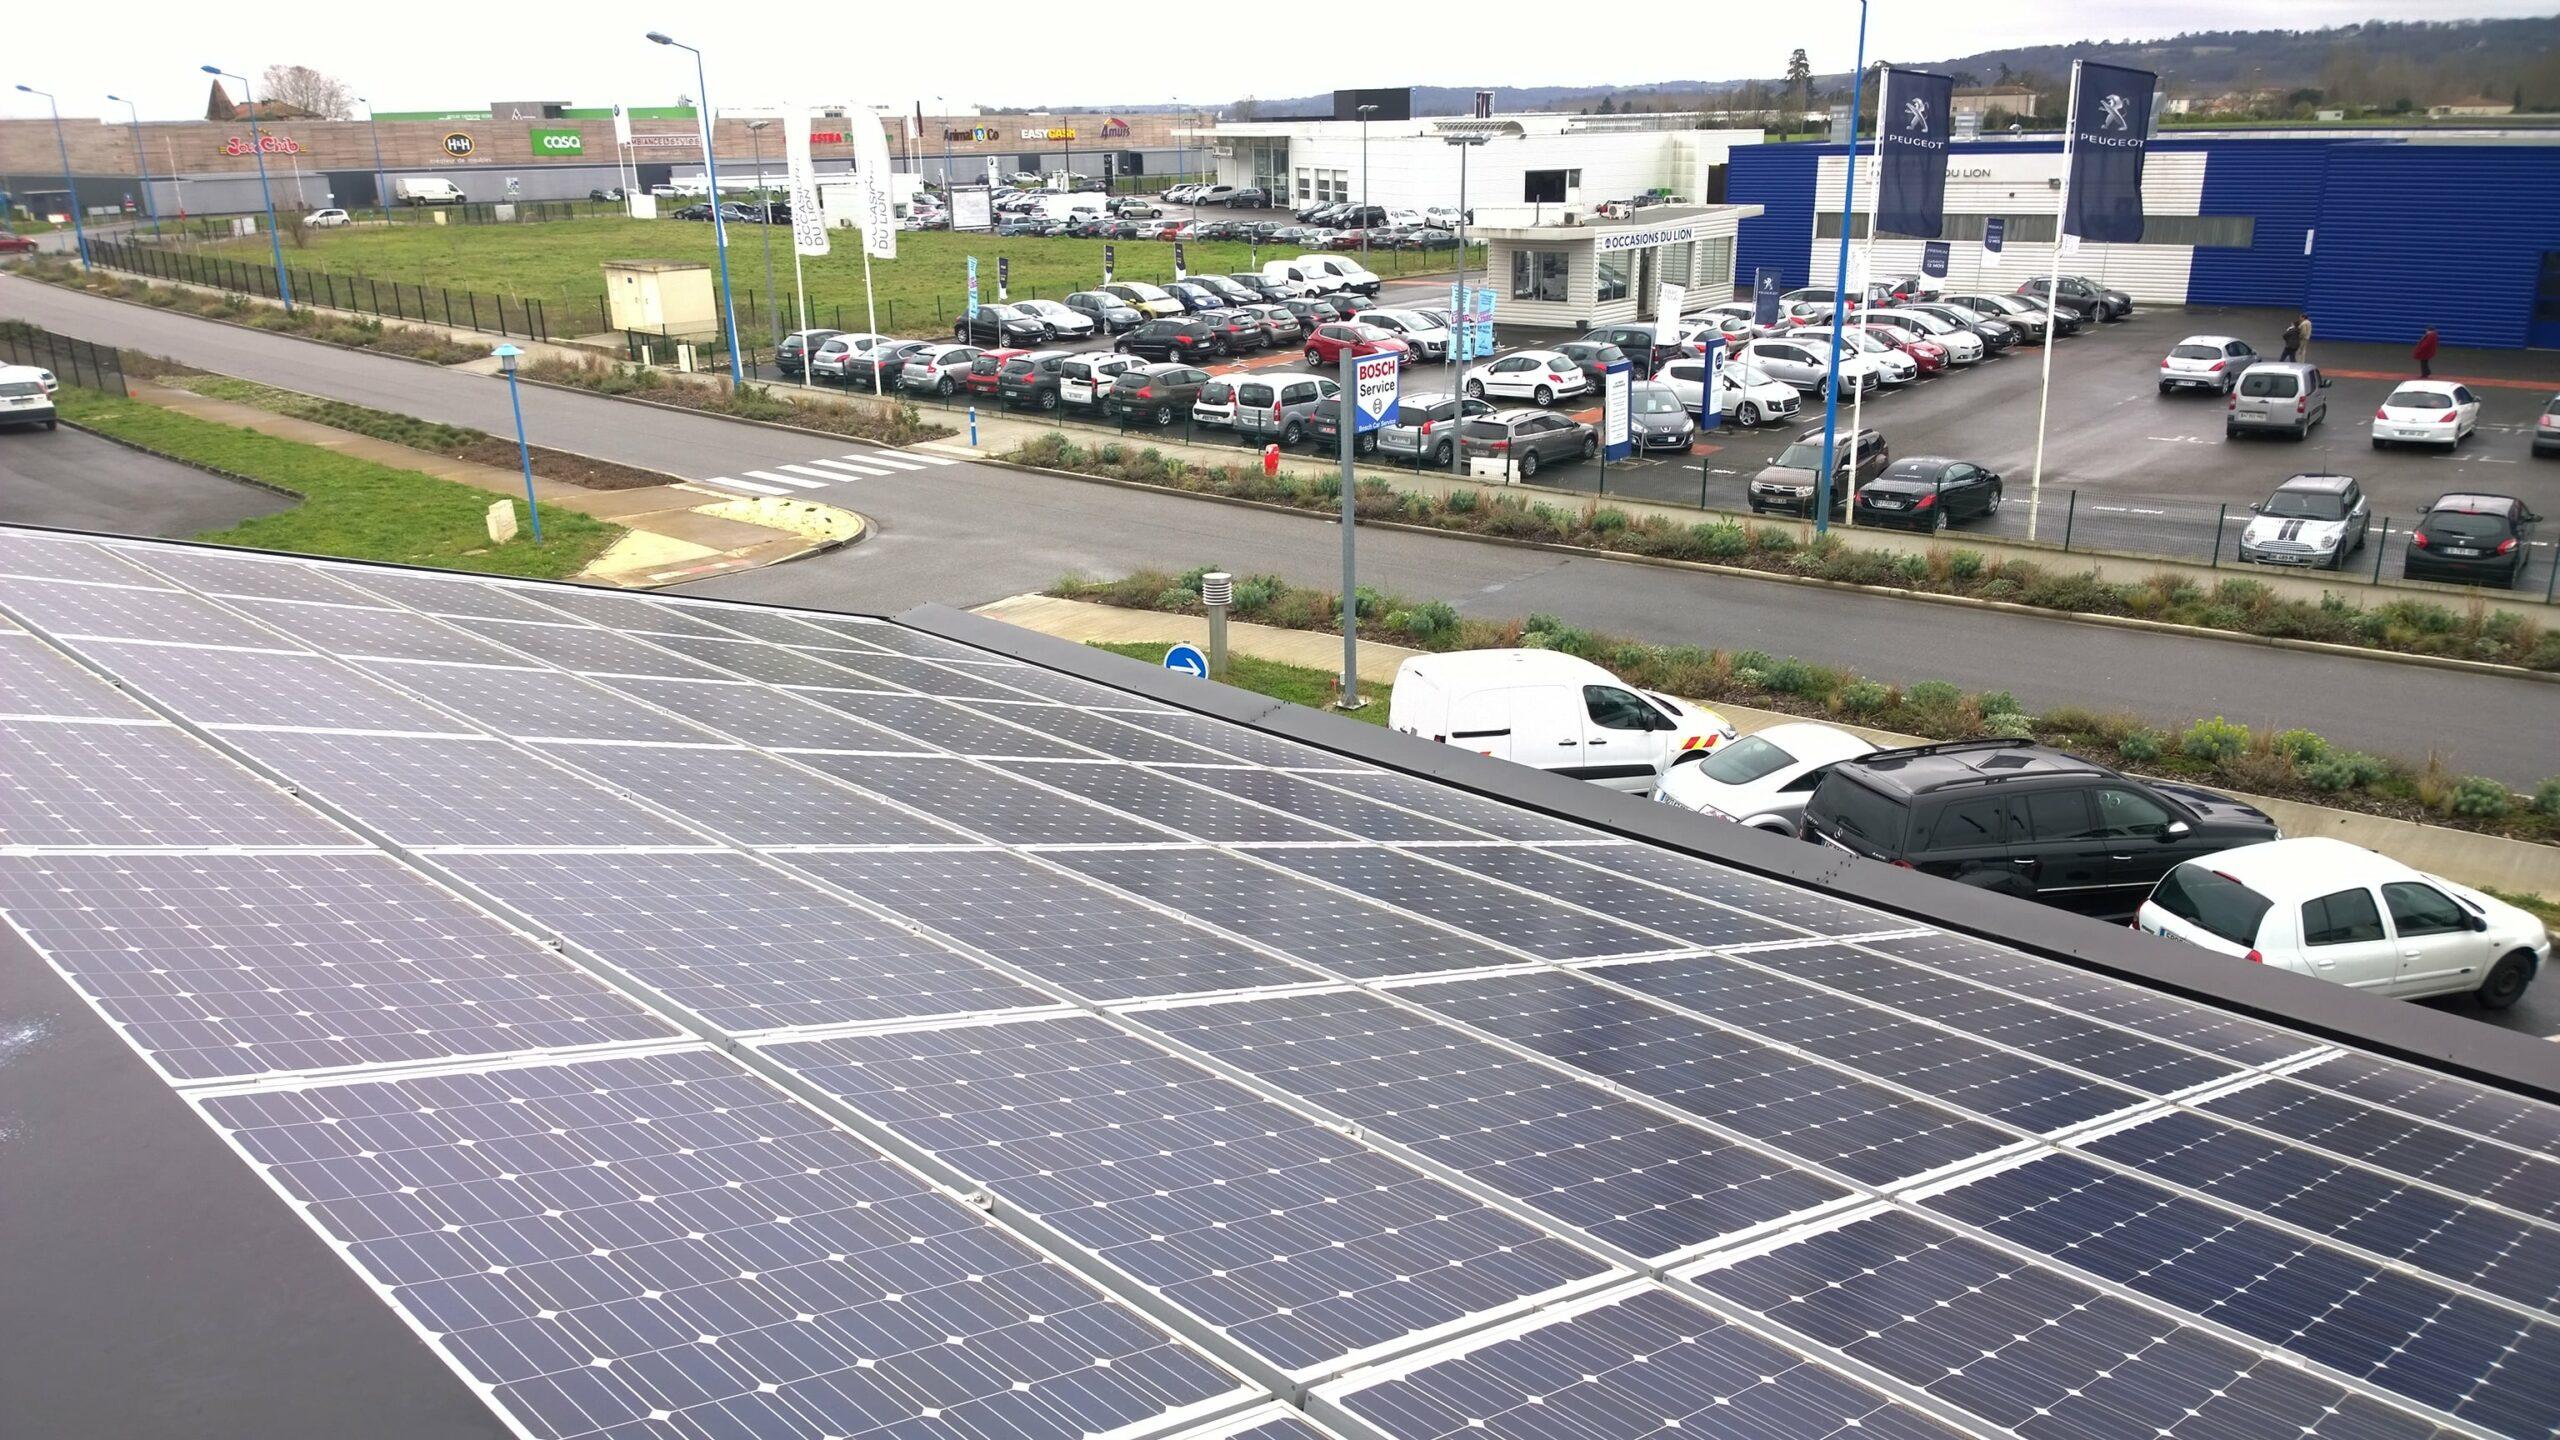 garage prope agen bosch car service electric mobile